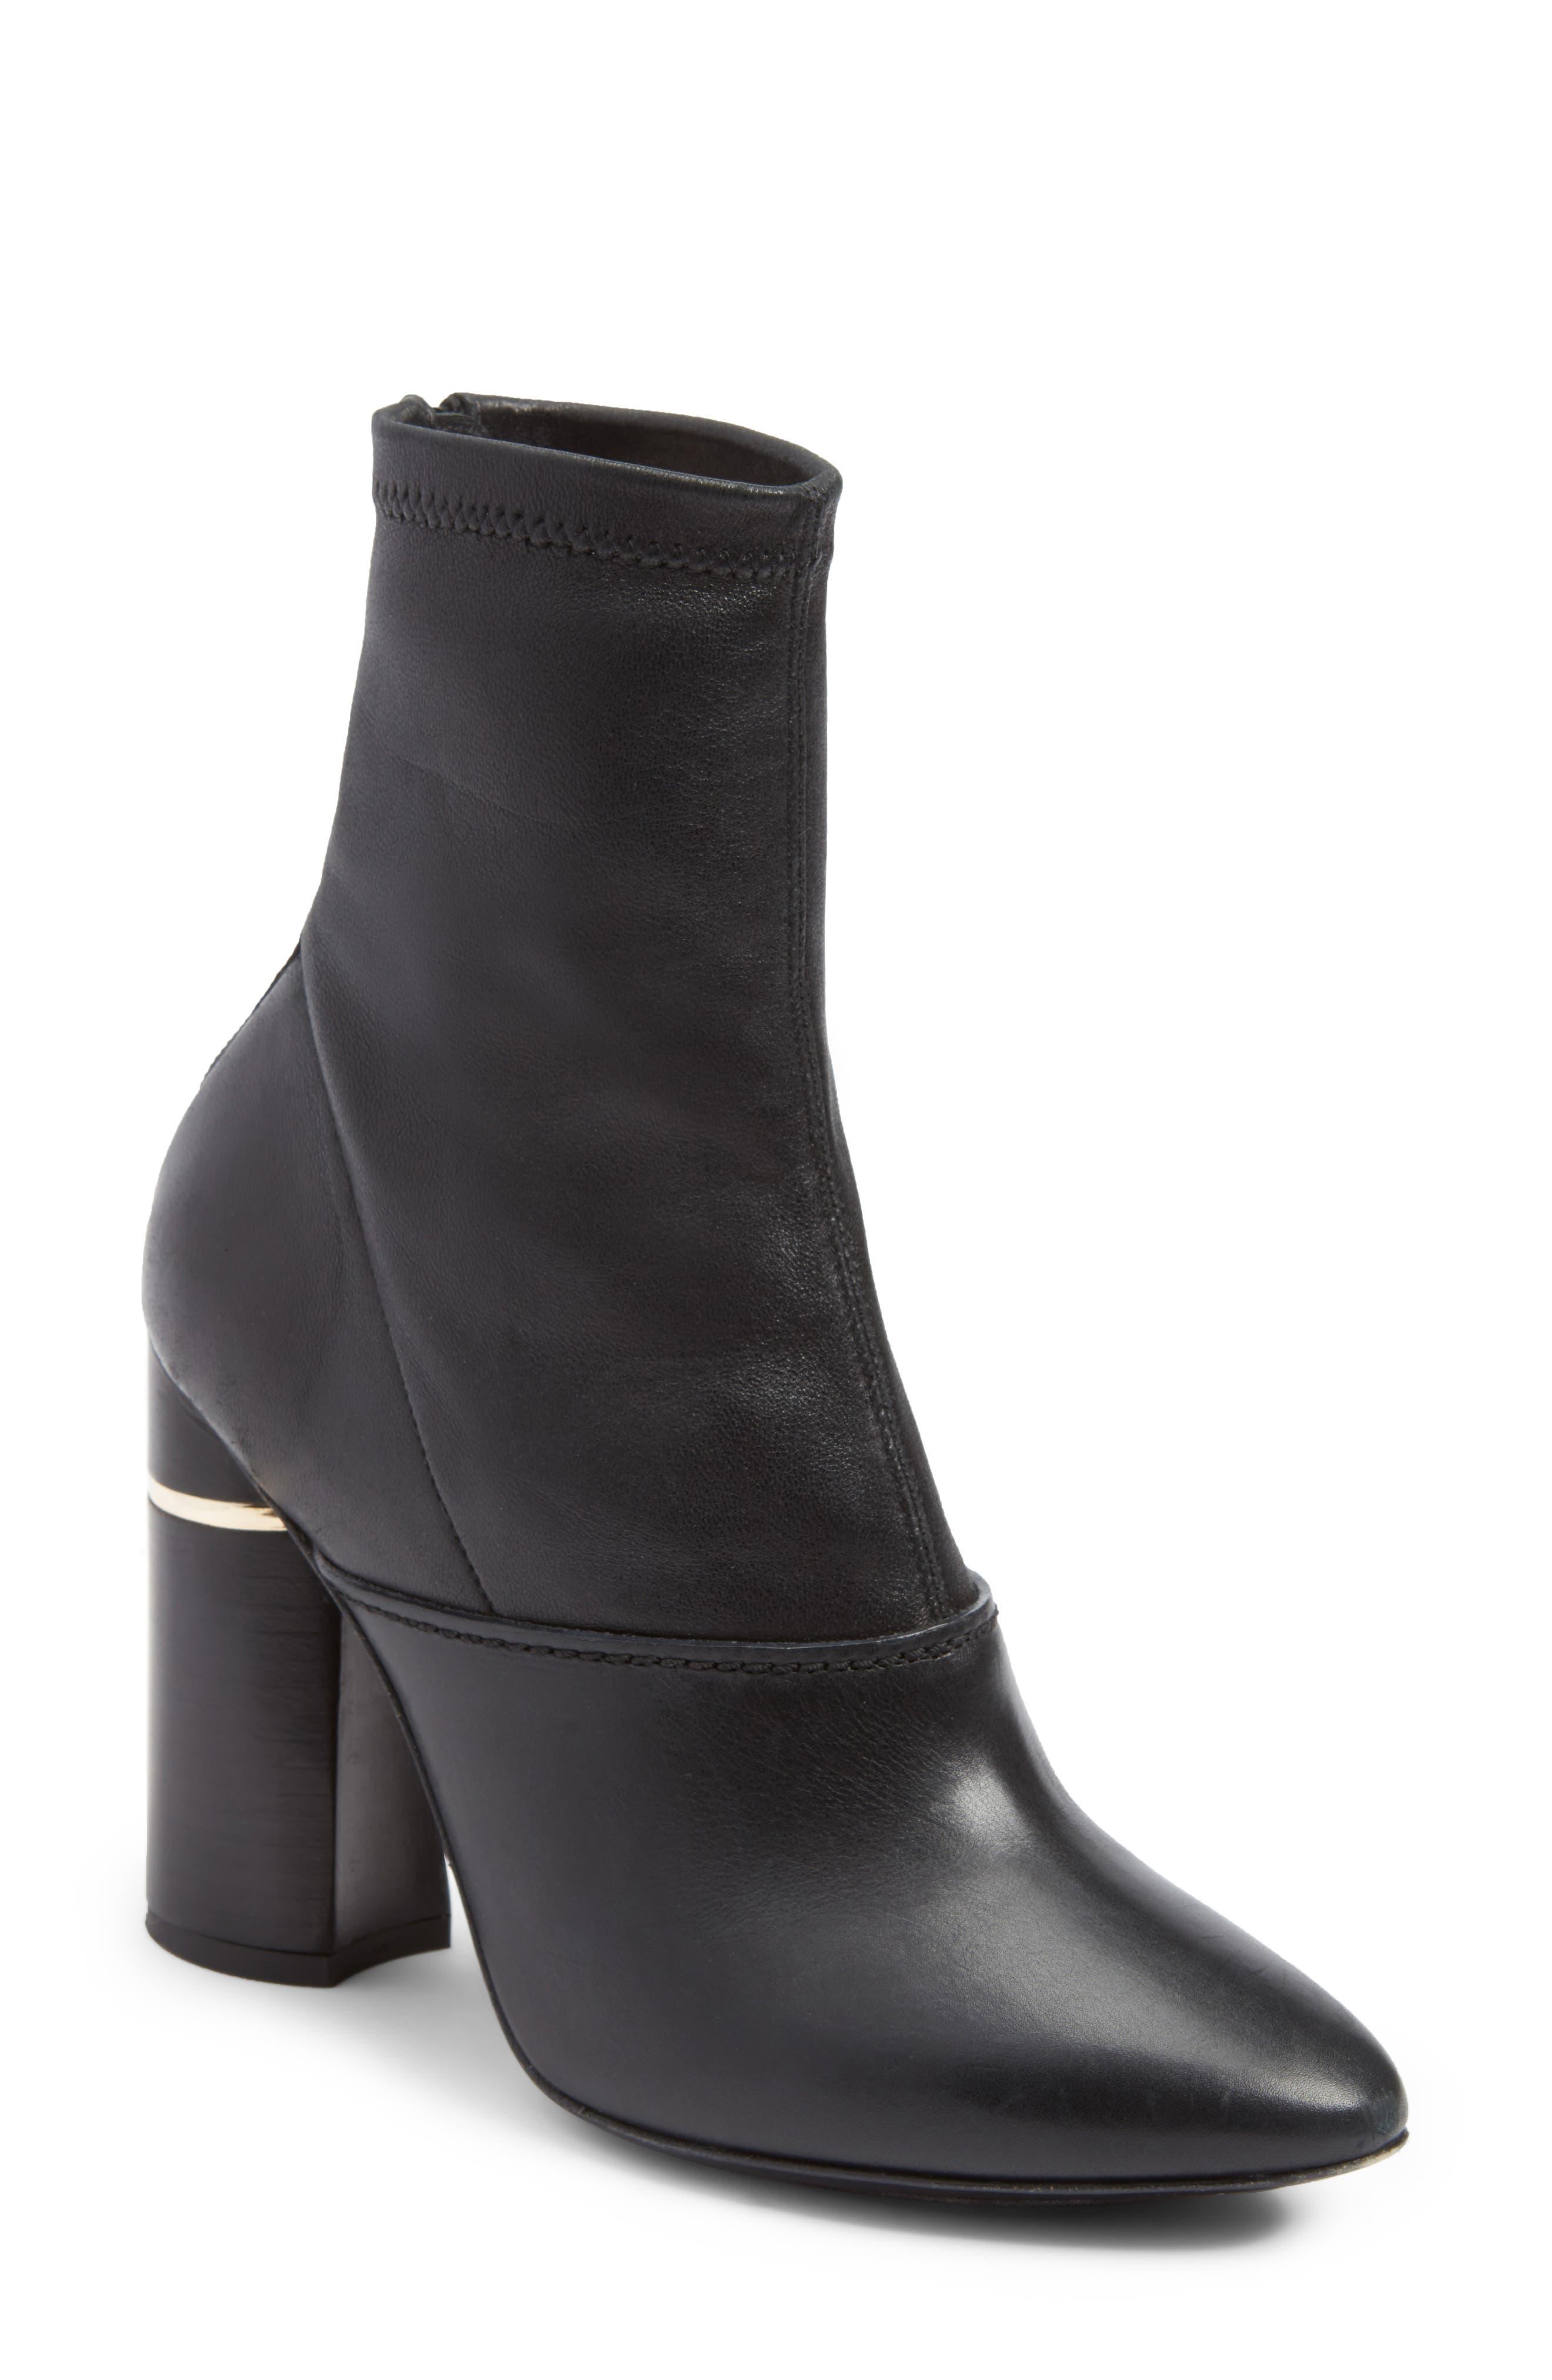 Kyoto Leather Bootie,                         Main,                         color, Black